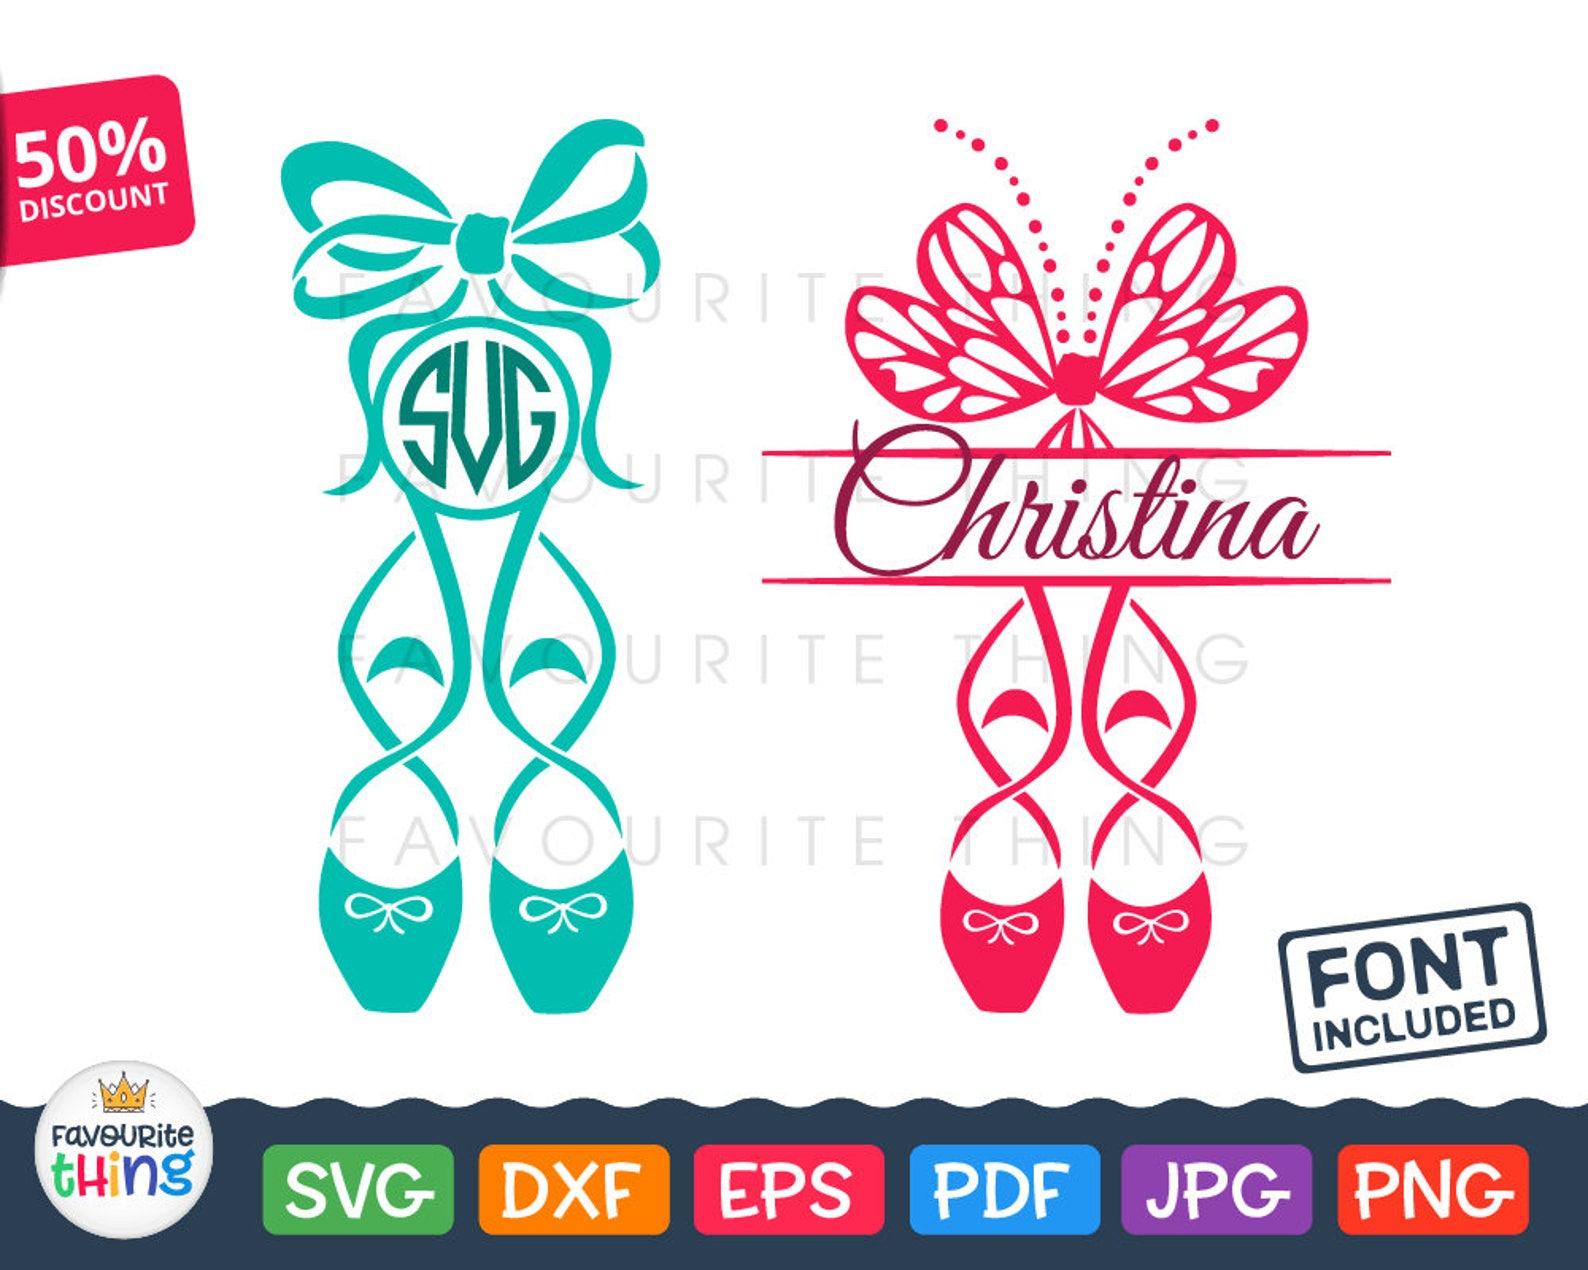 ballet shoes svg ballerina monogram svg little dancer initial frame svg cut file vinyl decal clip art download cricut silhouette